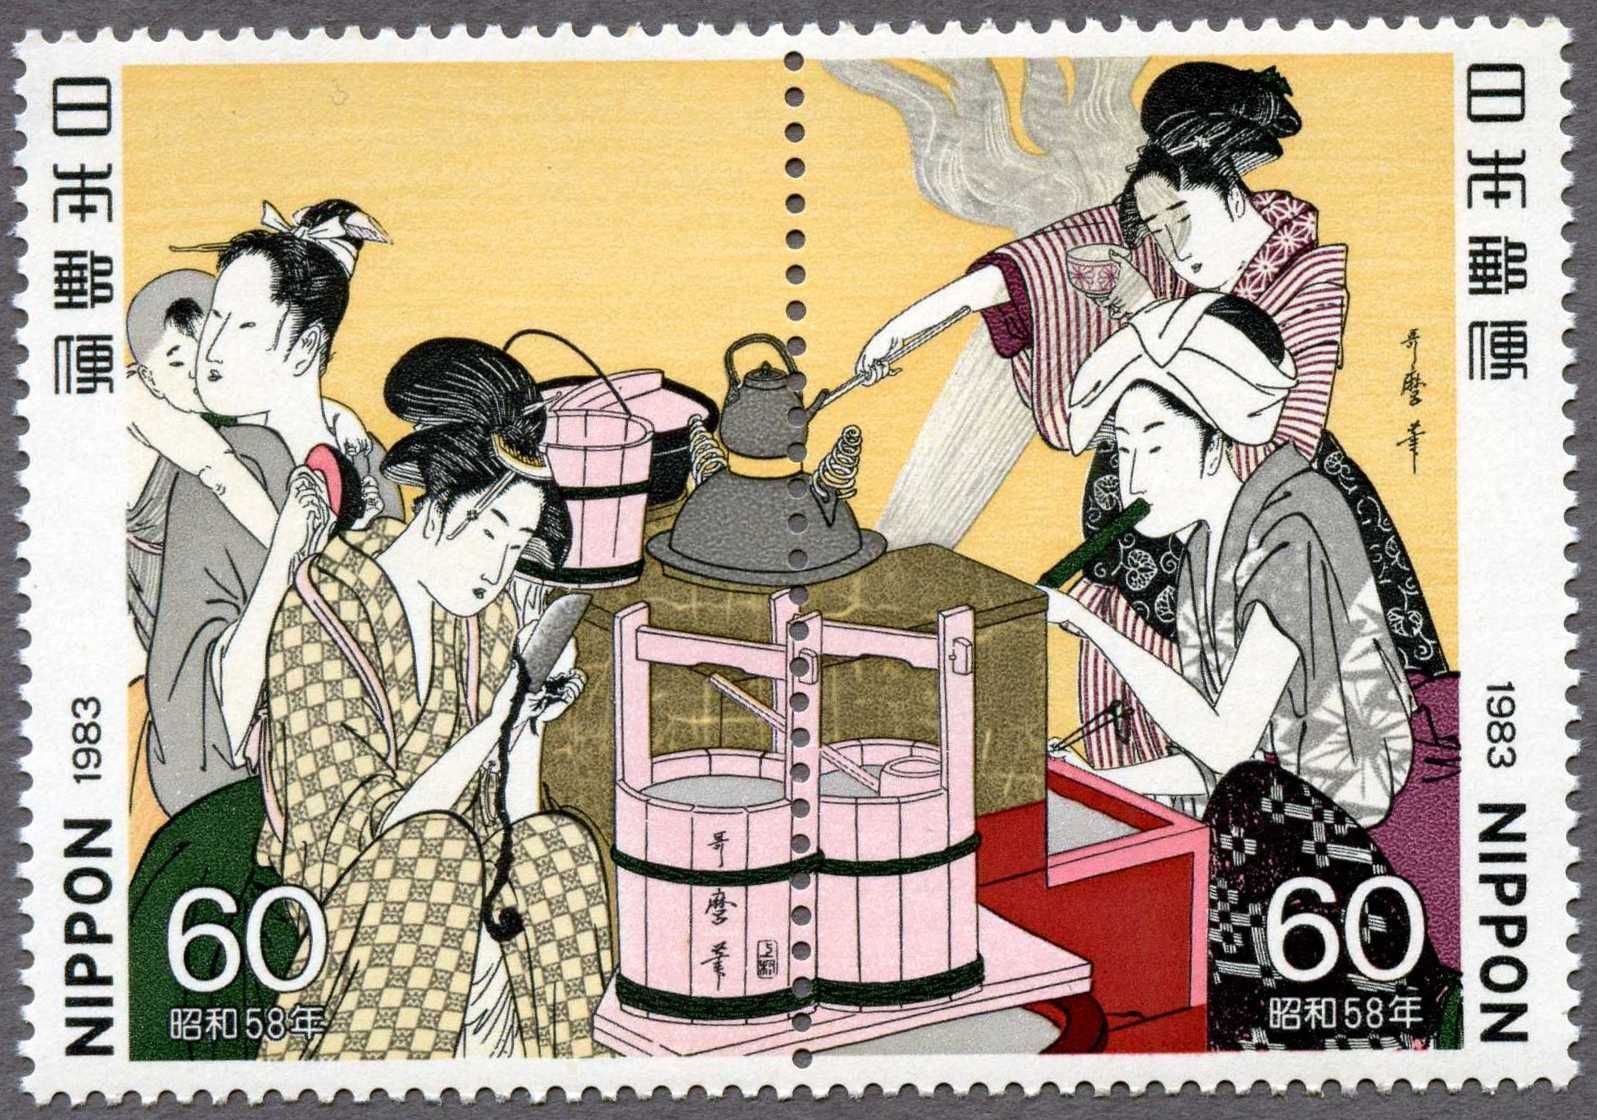 Stamp japan post 1983 estampillas pinterest for Correo postal mas cercano